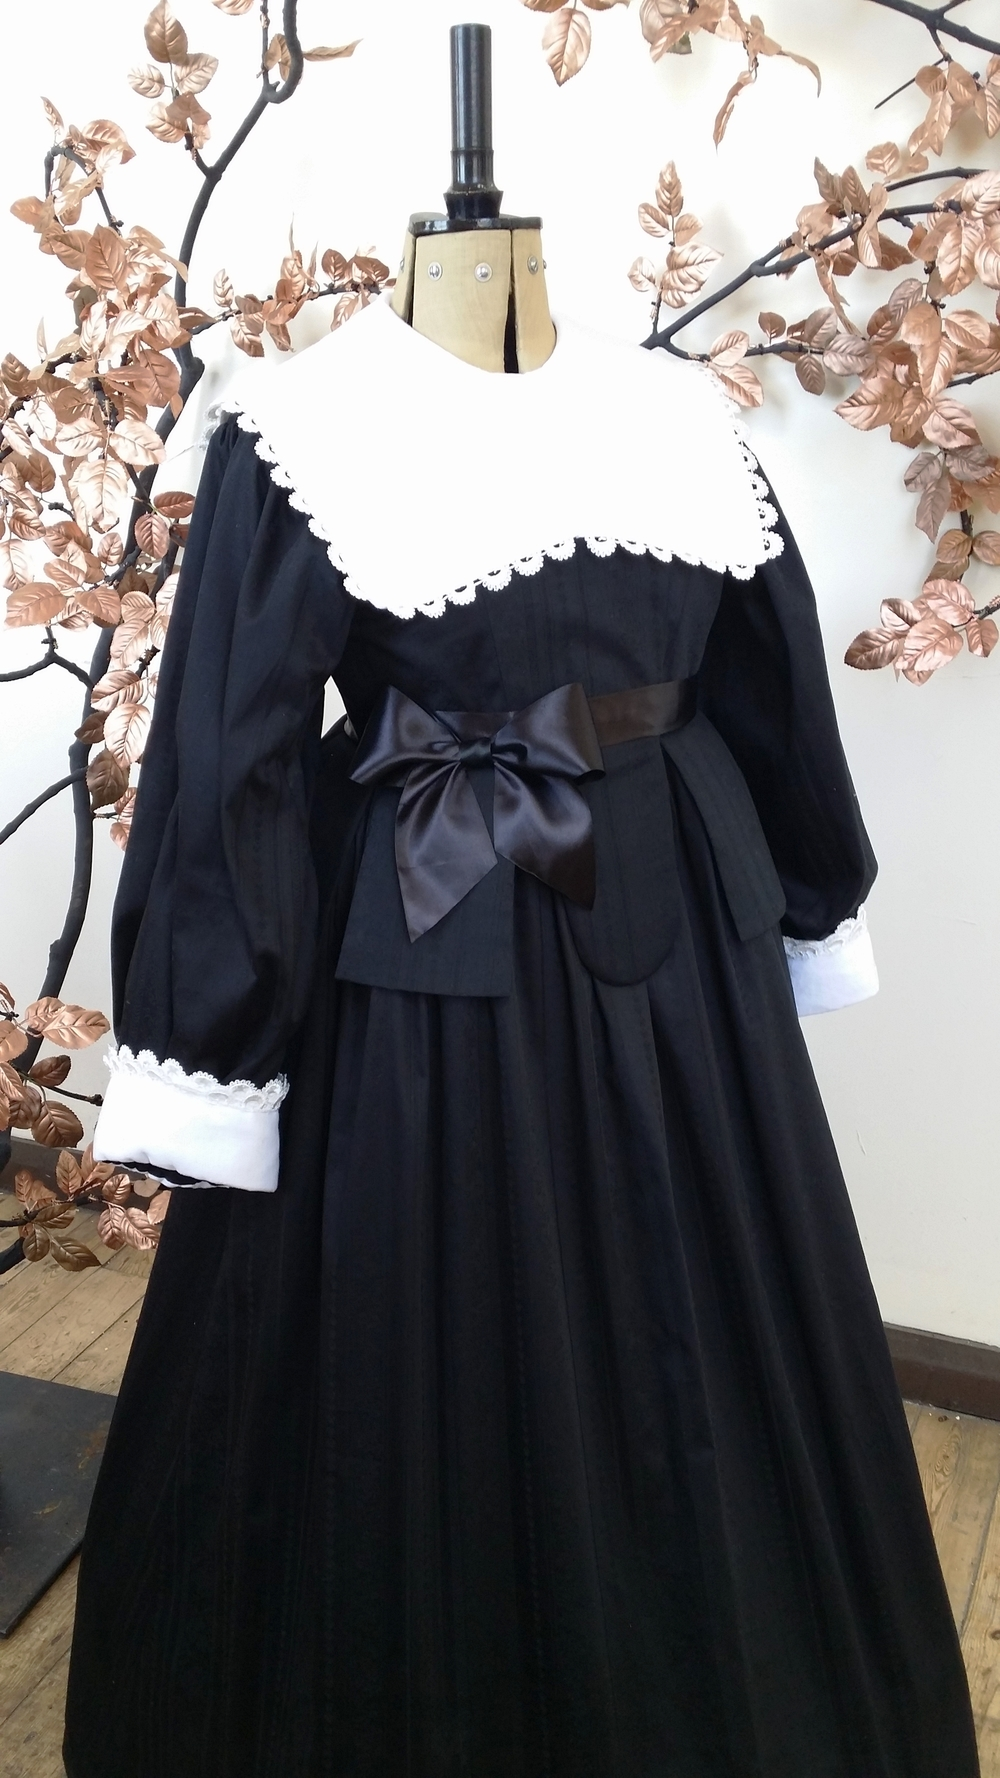 Rich Puritan Lady